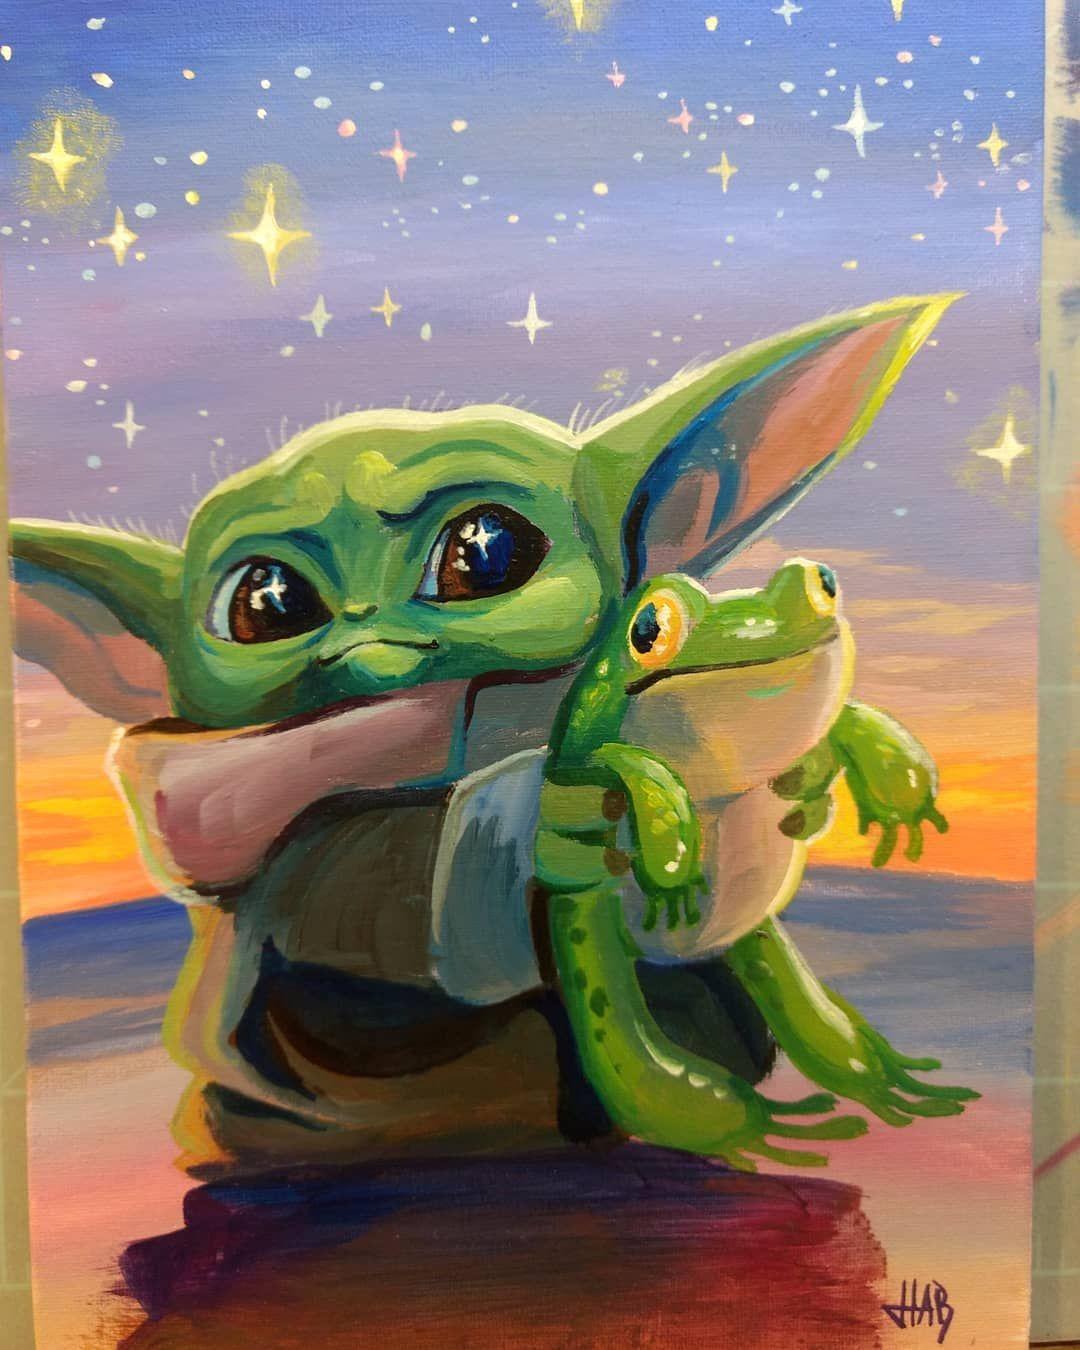 Froggy Friend Babyyoda Yodababy Thechild Themandalorian Mando Yoda Starwars Stars Frog Froggy Paintin Yoda Art Star Wars Painting Yoda Artwork